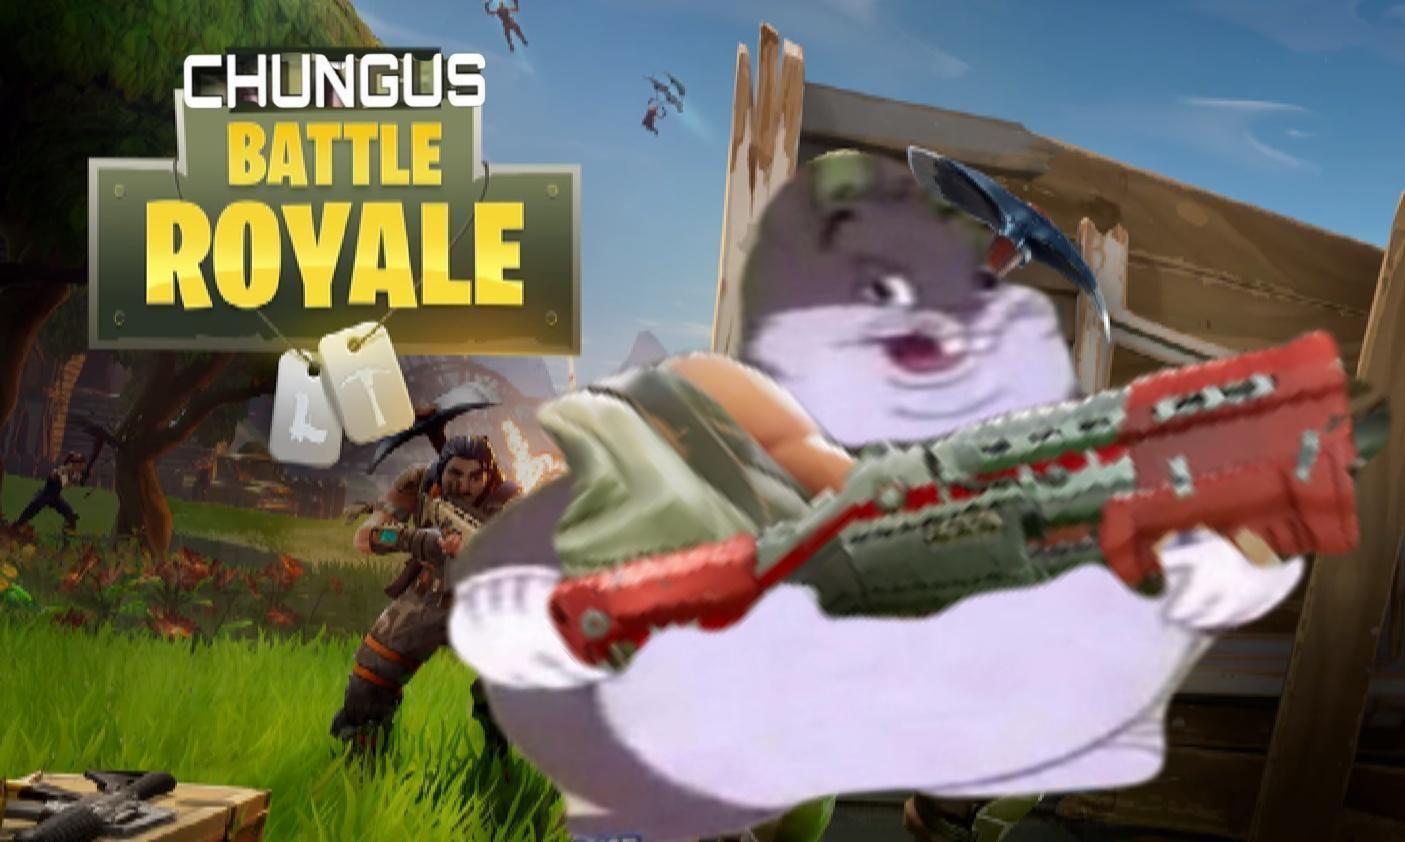 Chungus Battle Royale Memes Funny Memes Cartoon Memes